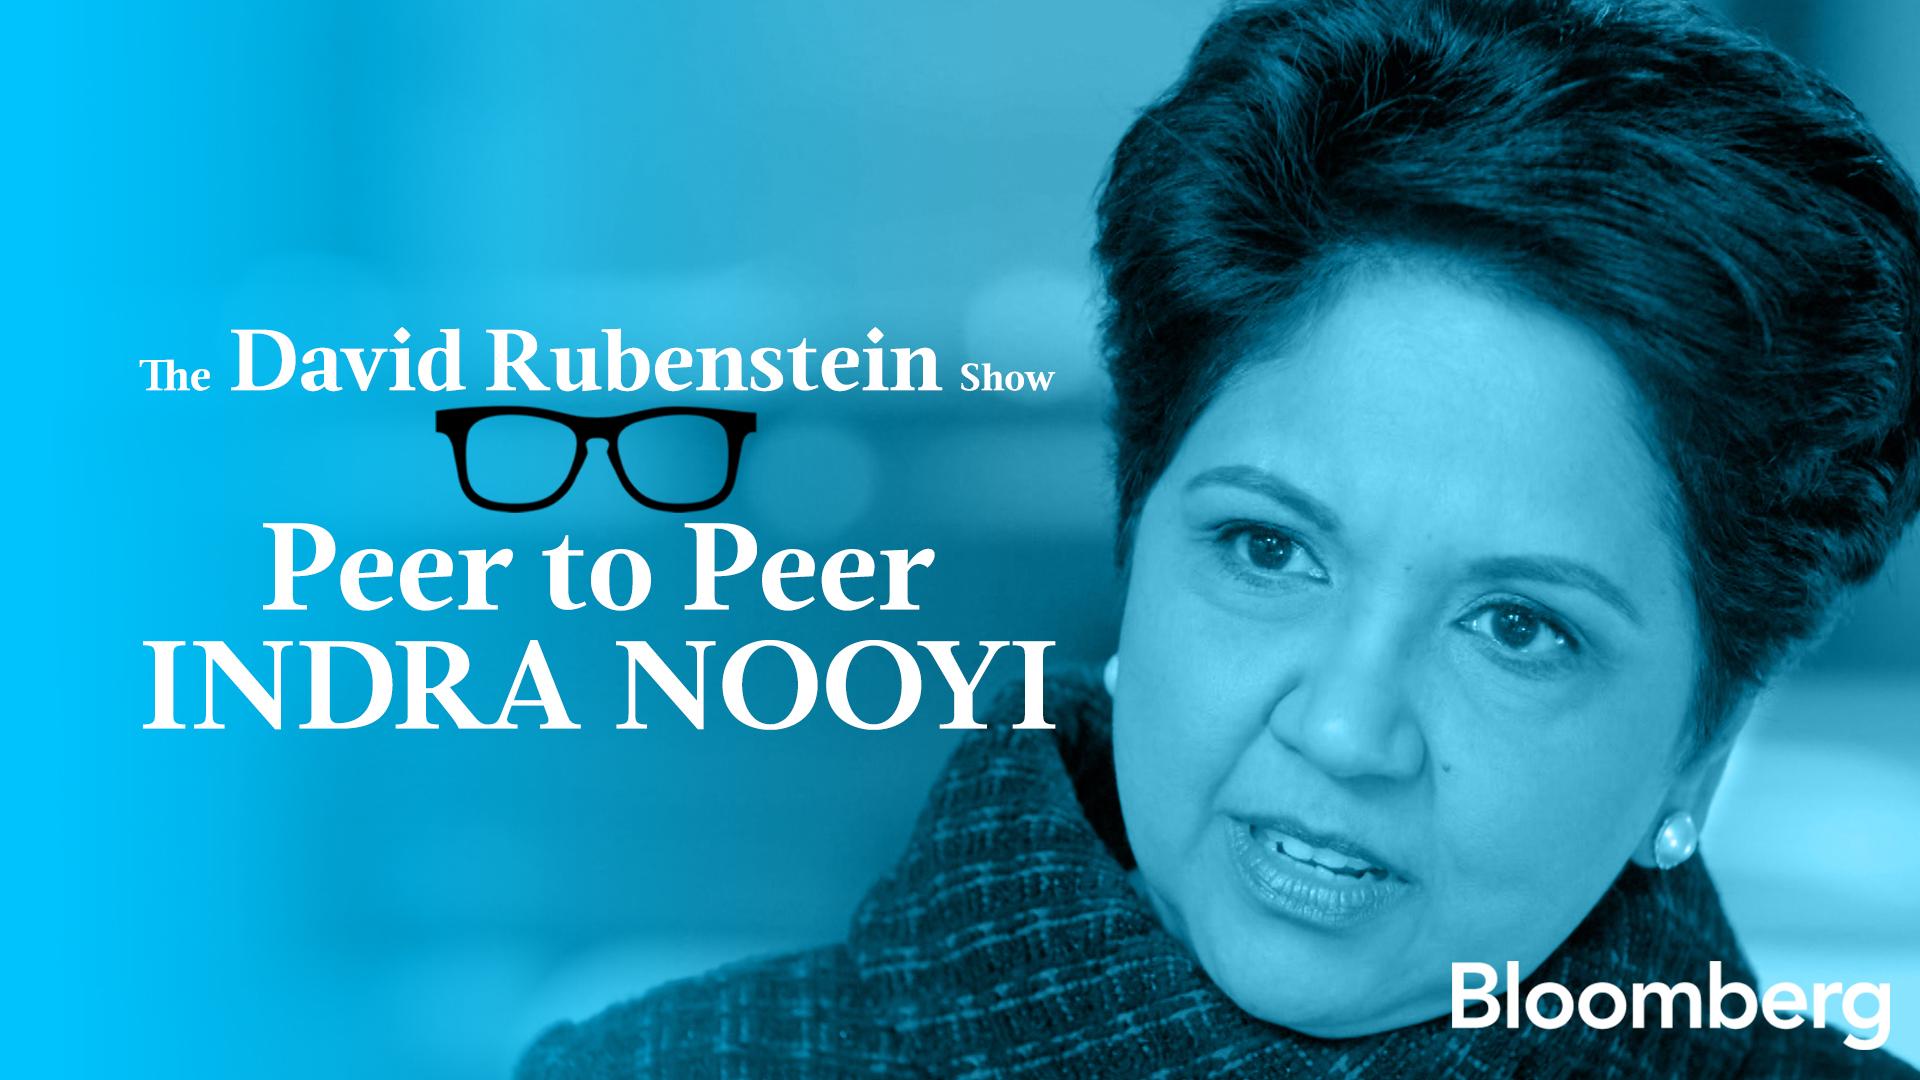 Indra Nooyi Peer to Peer: The David Rubenstein Show - Bloomberg